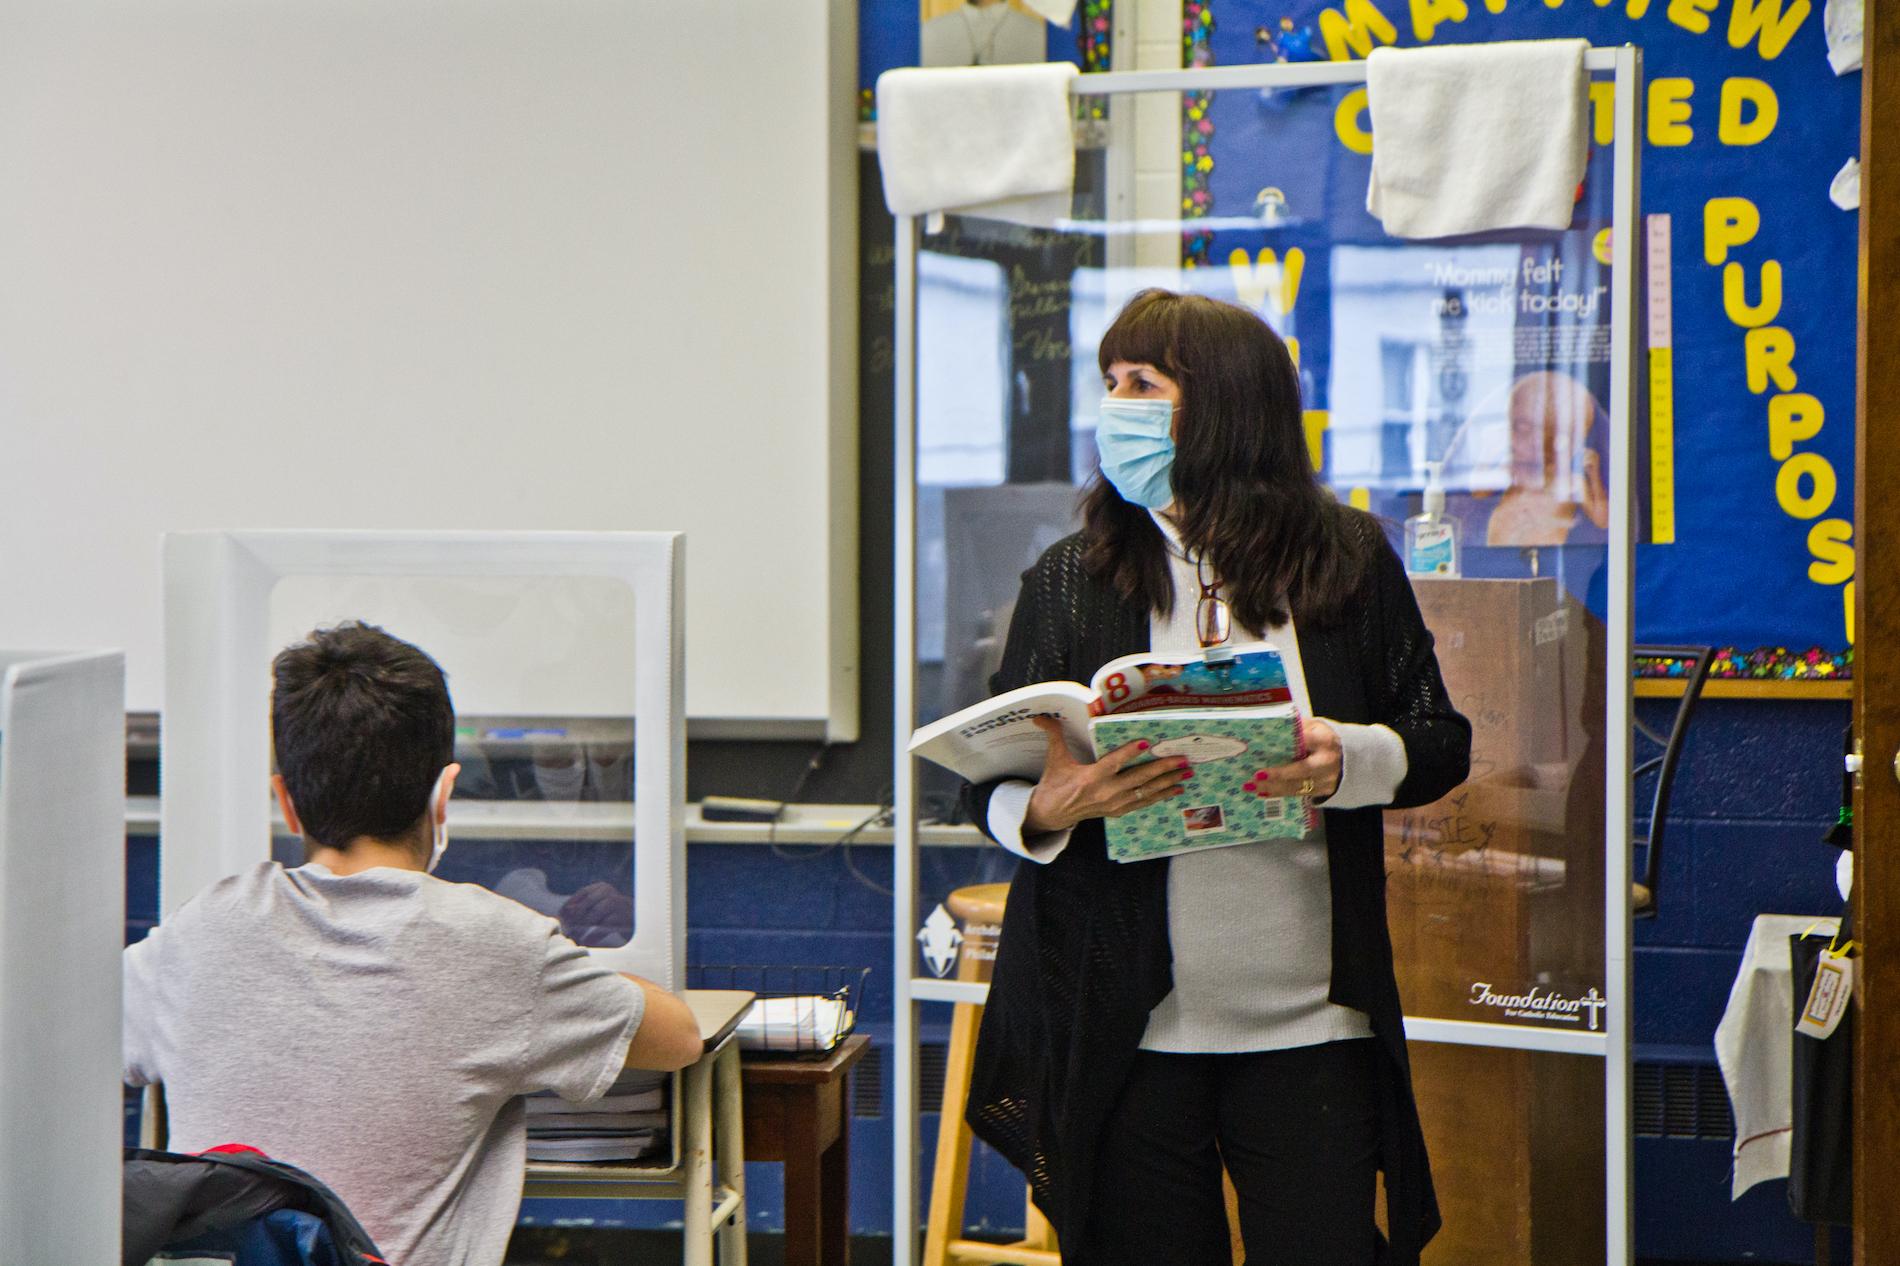 Eighth grade teacher Theresa Polizzi in her class at St. Pio Regional Catholic School in South Philadelphia.